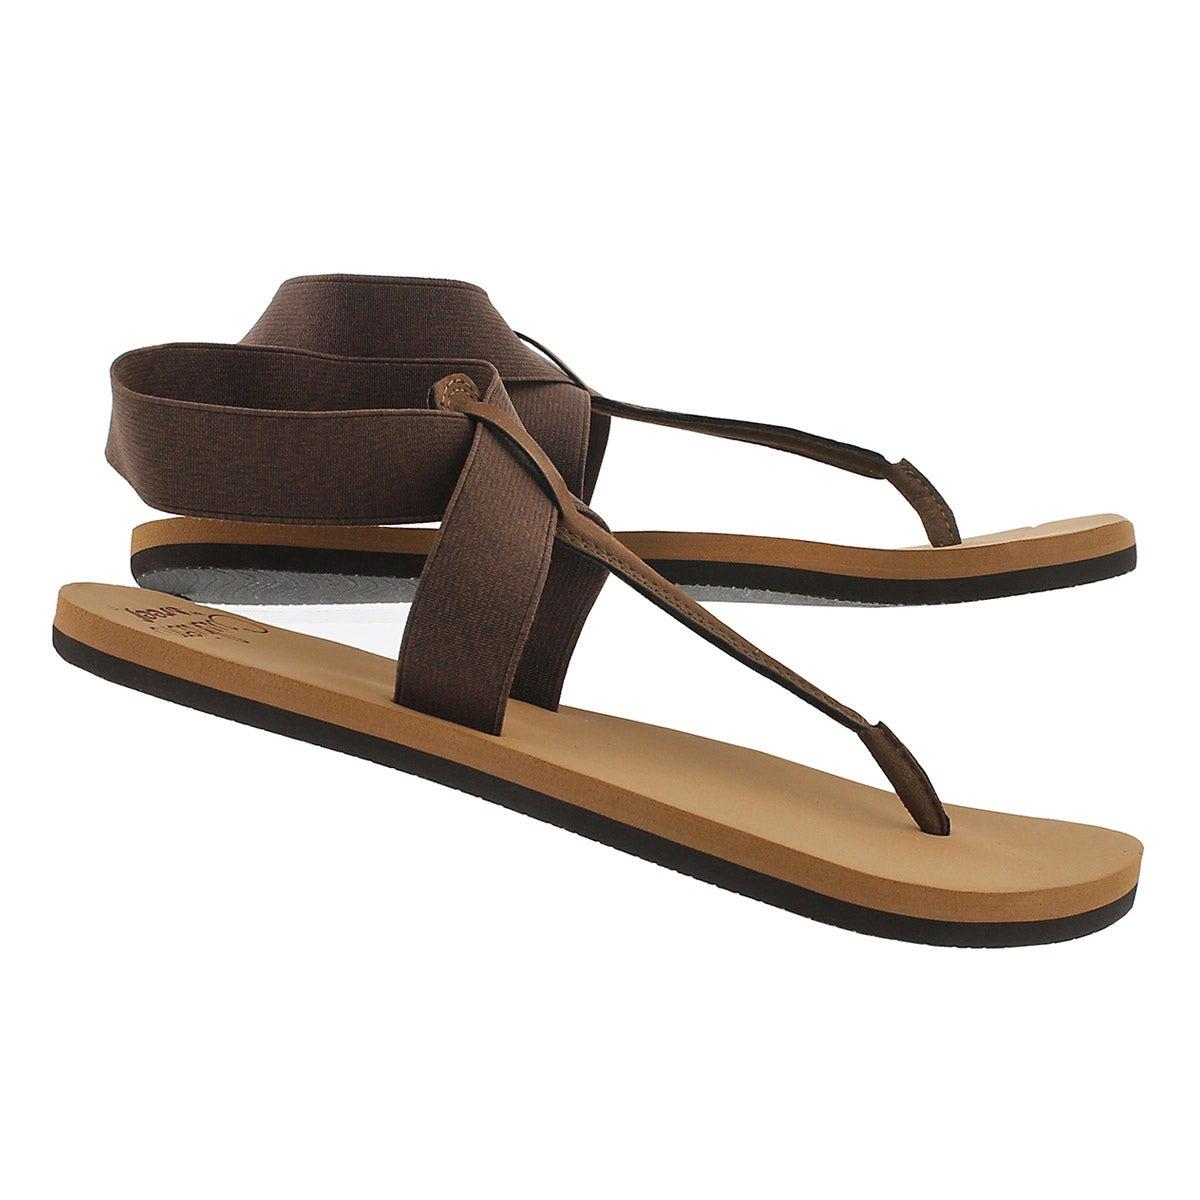 Lds Cushion Moon brown thong sandal